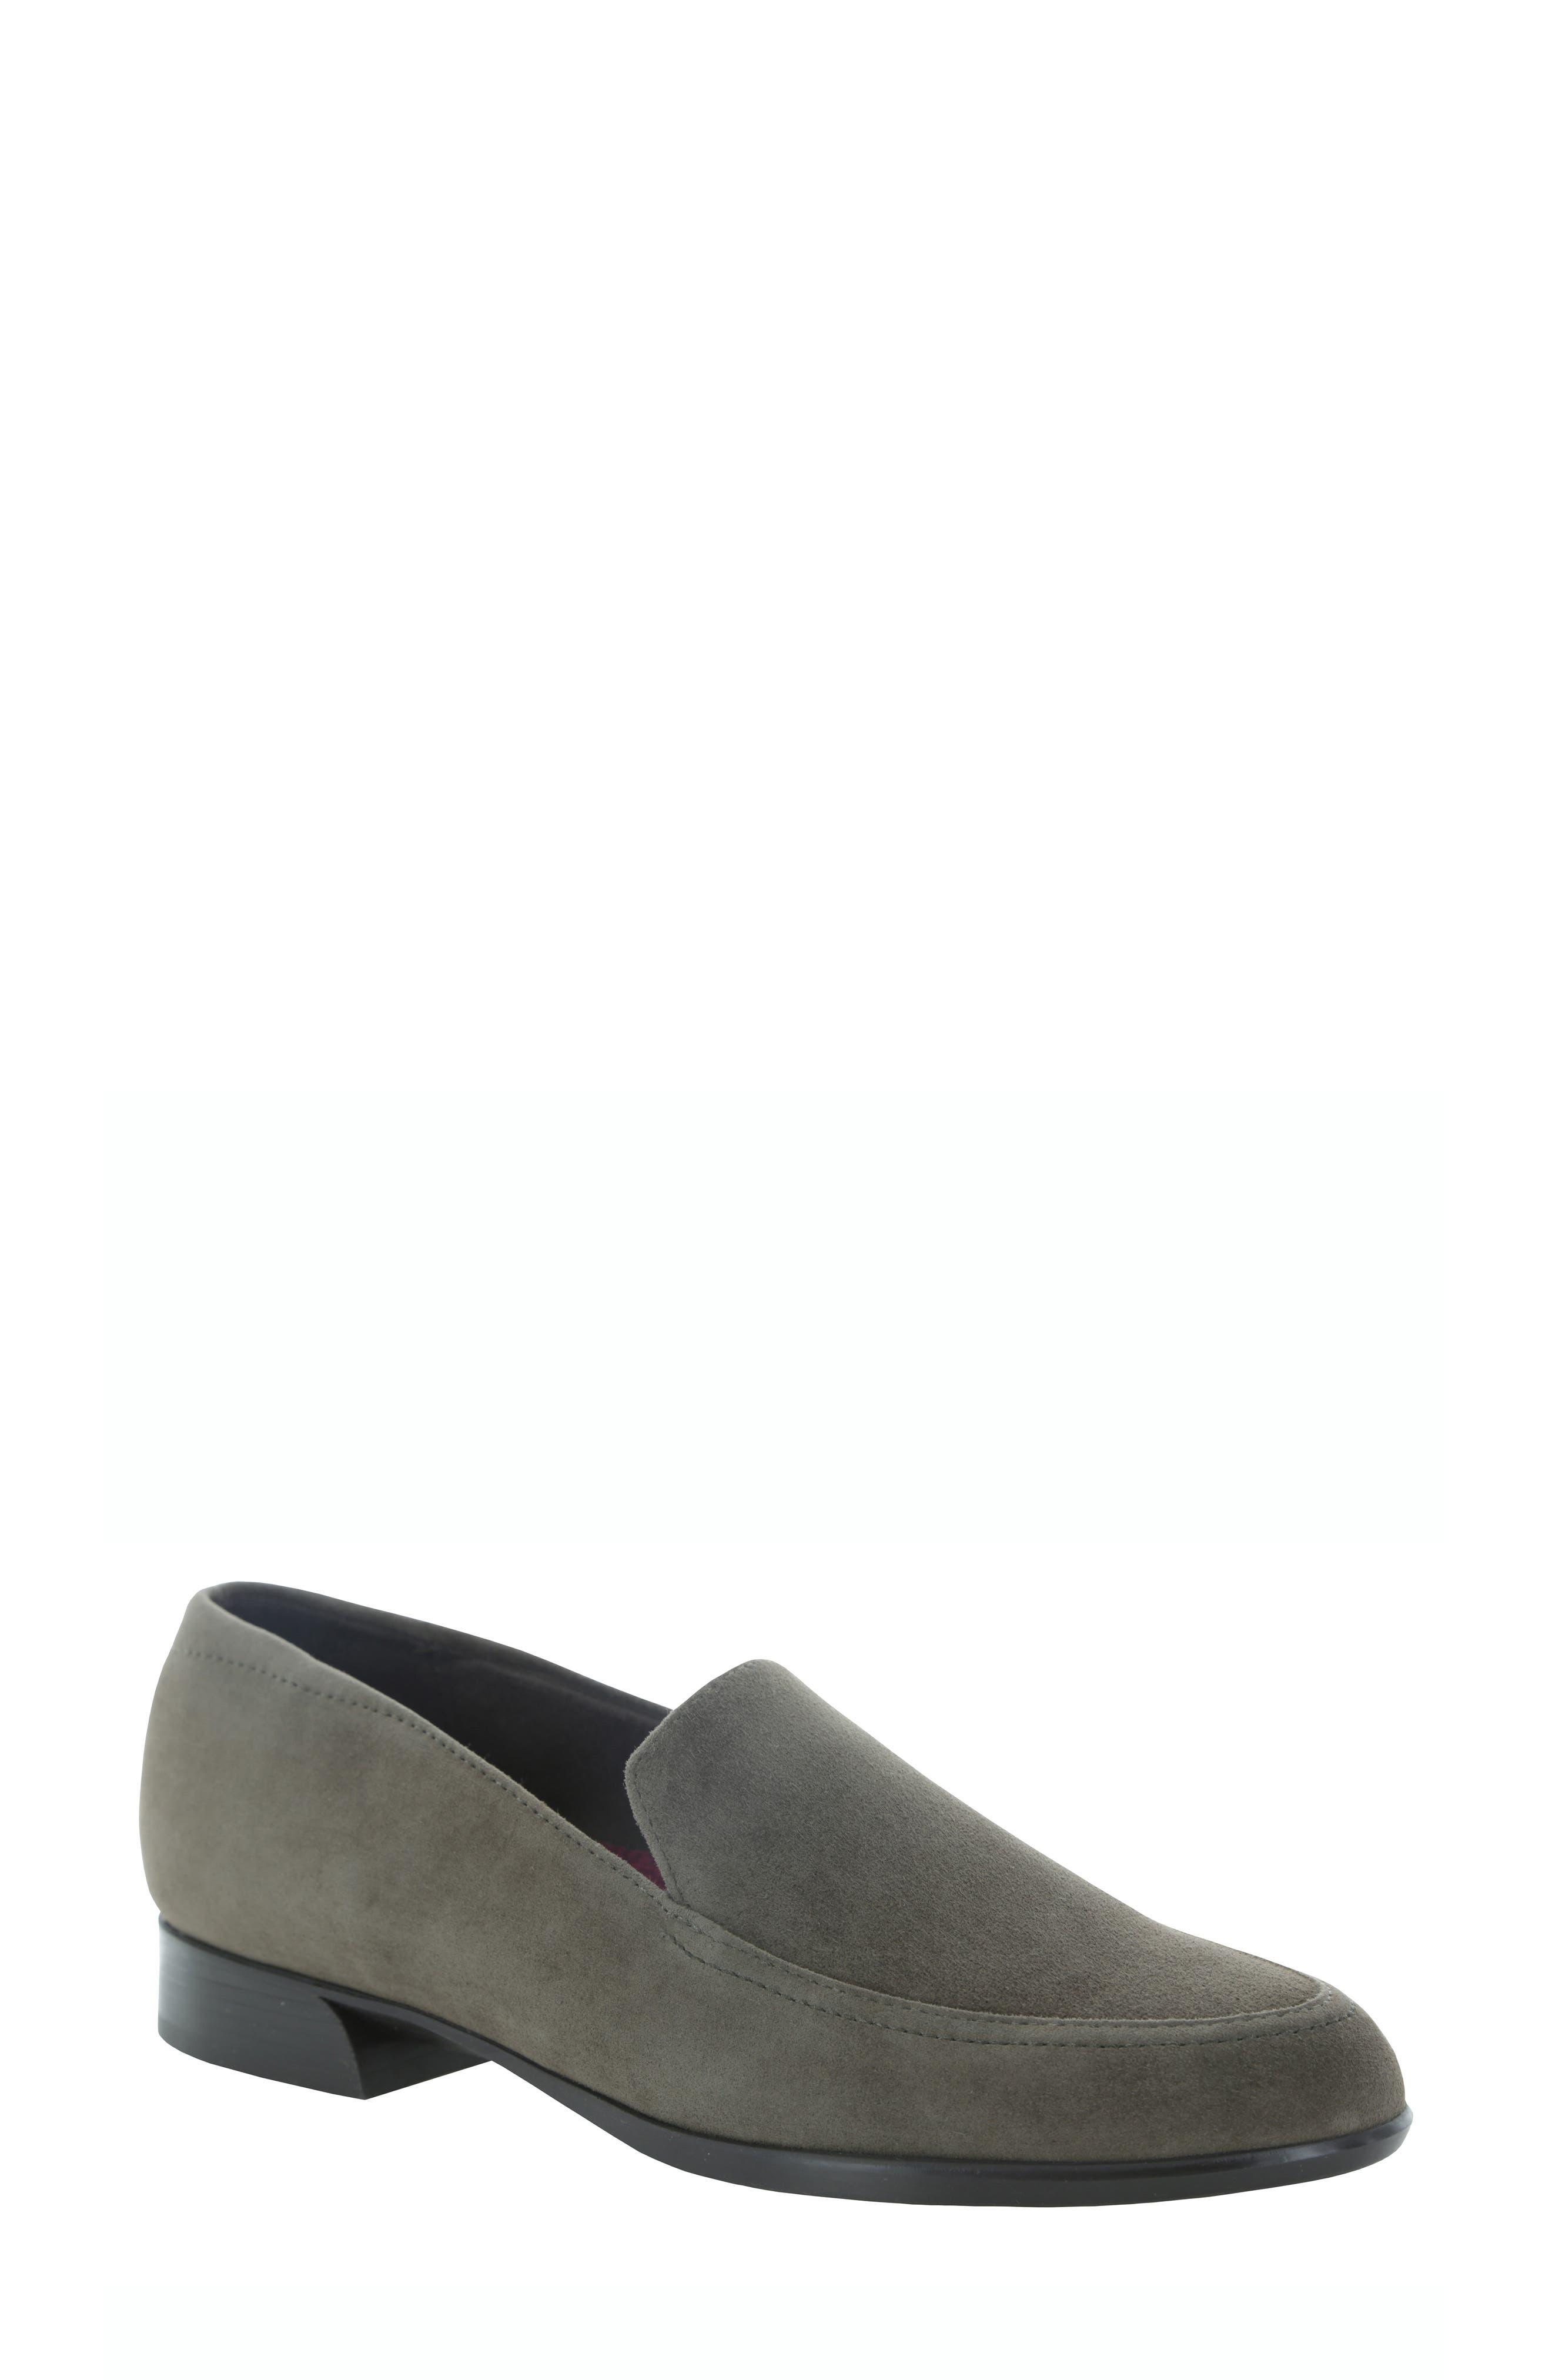 Munro Harrison Loafer, Grey